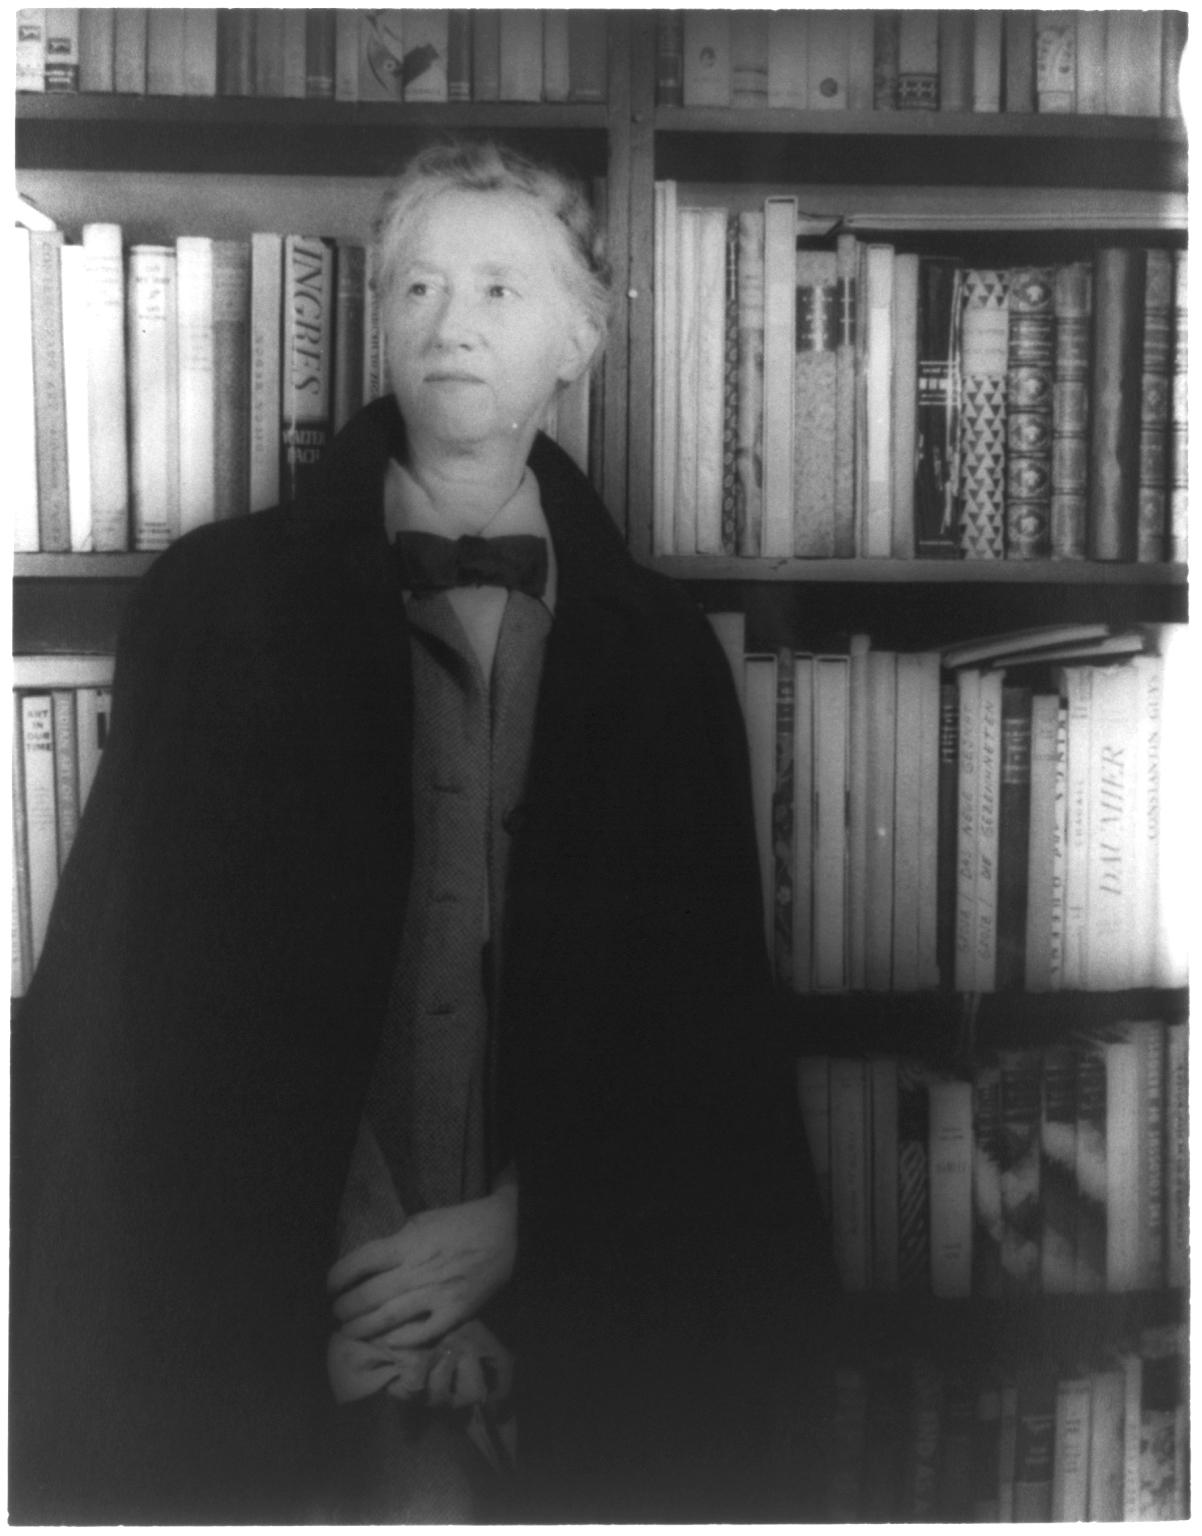 Photograph by [[Carl Van Vechten]] (1948)